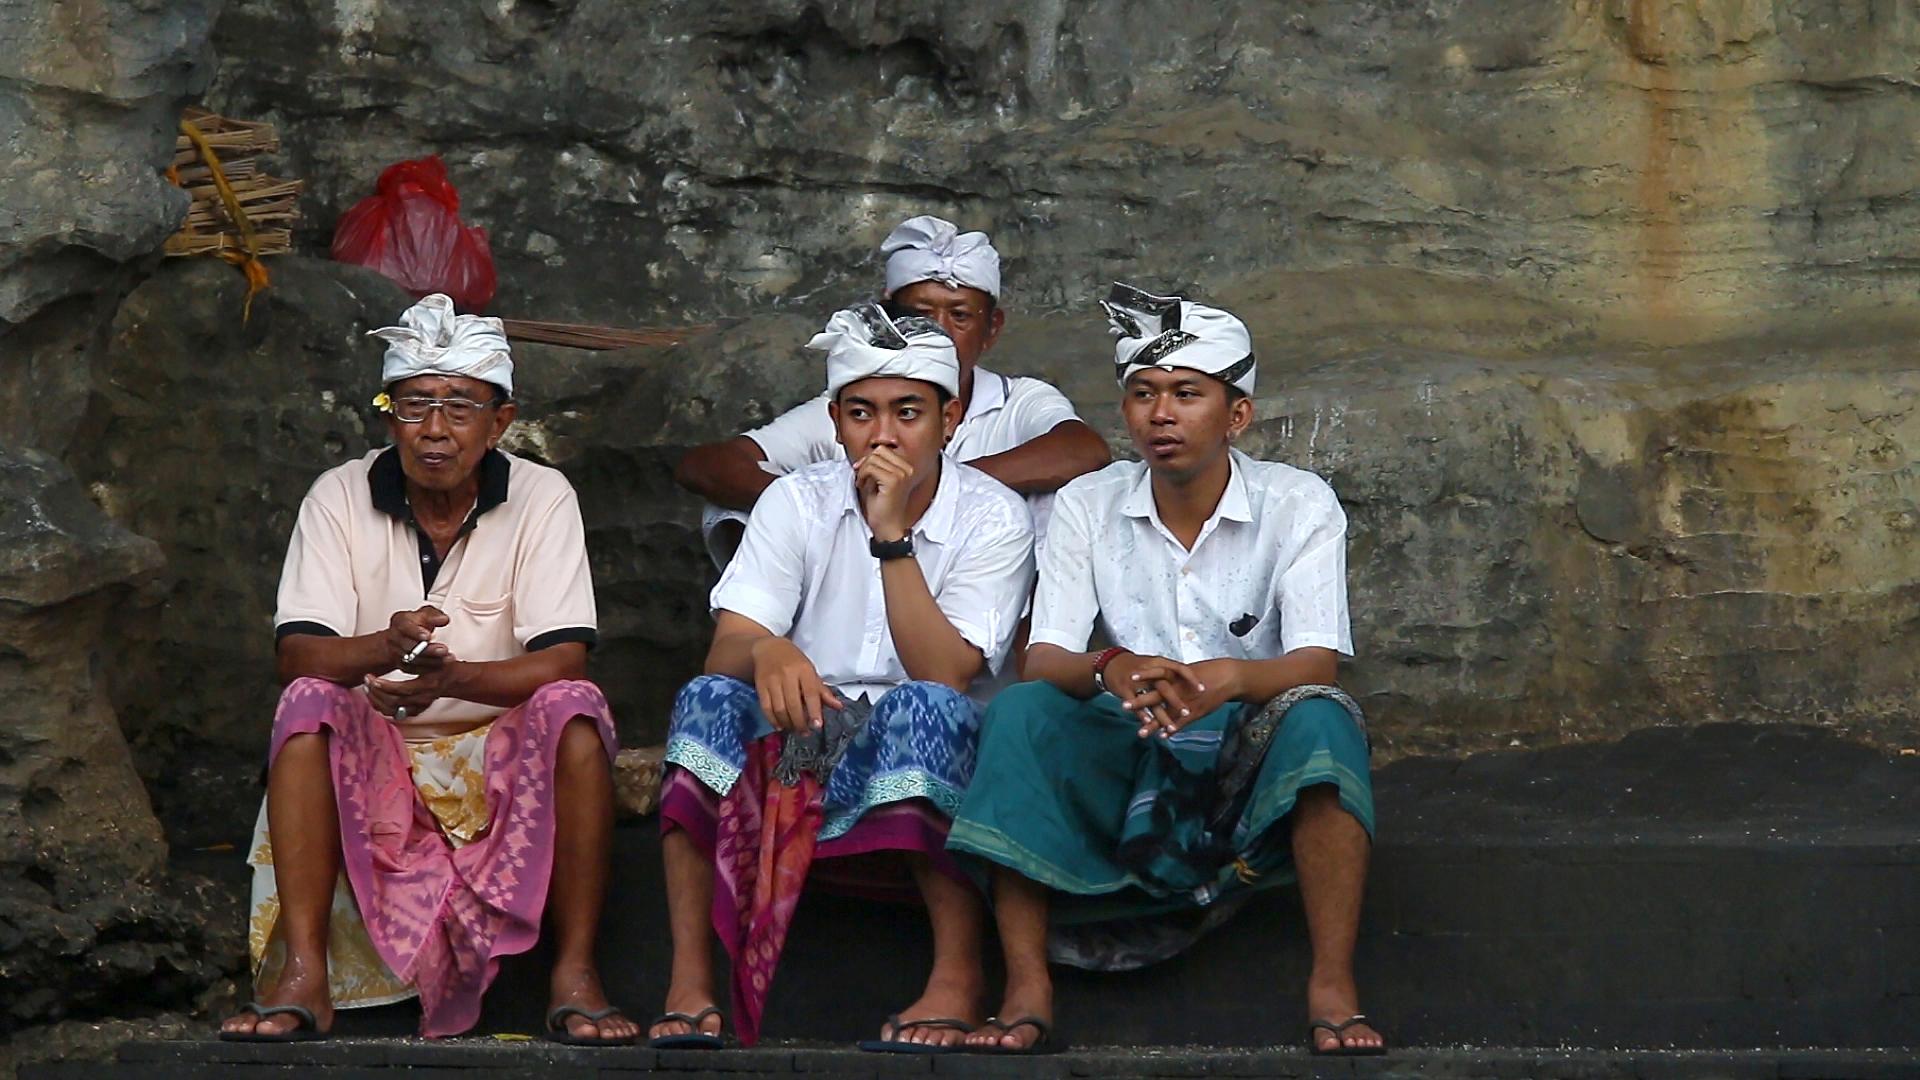 Indonésie, Bali, prières, hindouisme, pura tanah lot